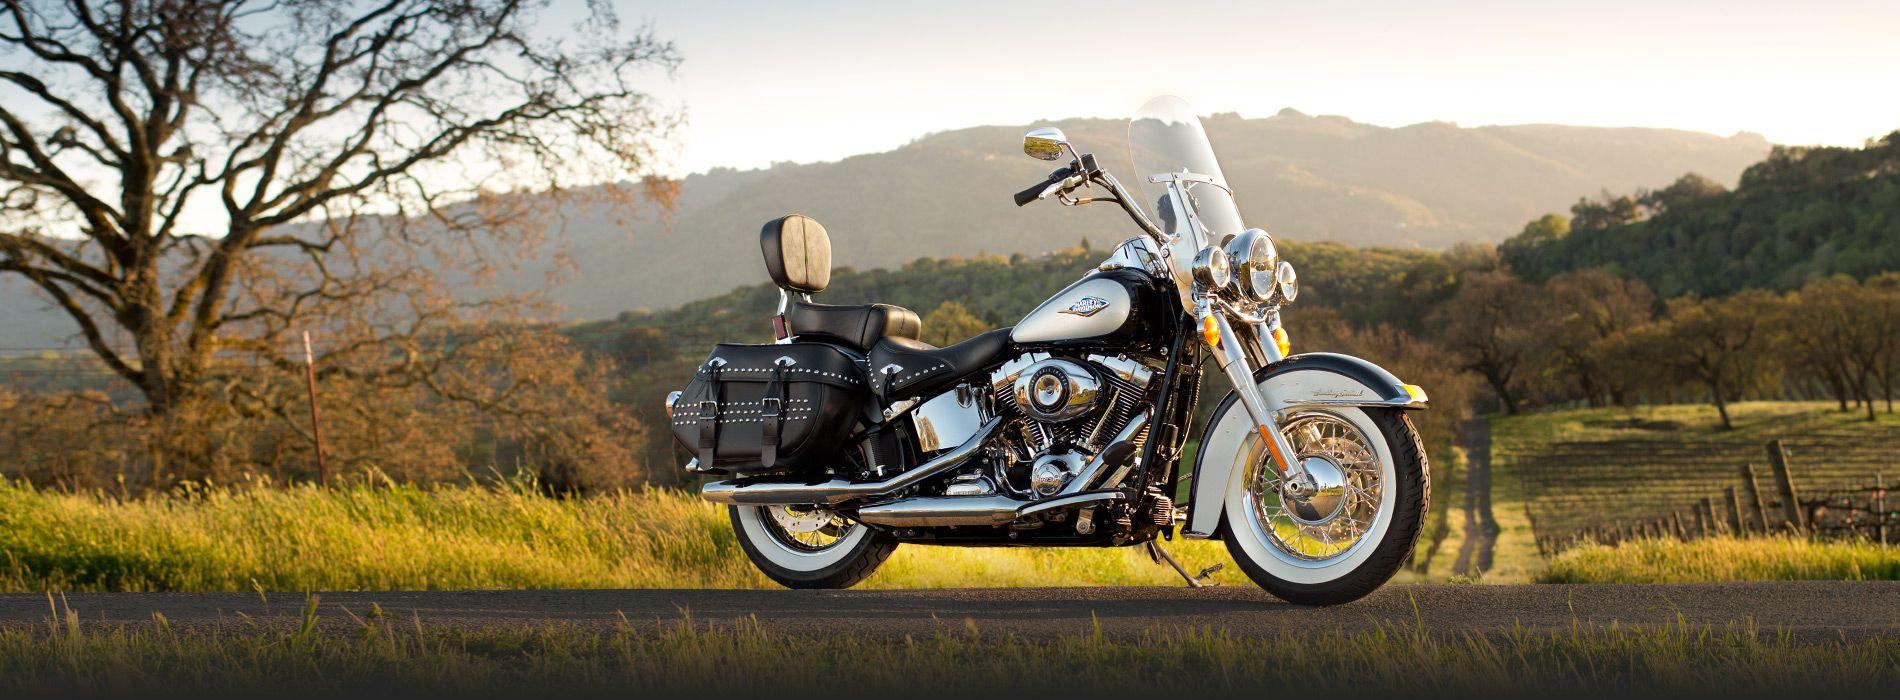 Heritage Softail FLSTC   Moto 2013   Harley-Davidson